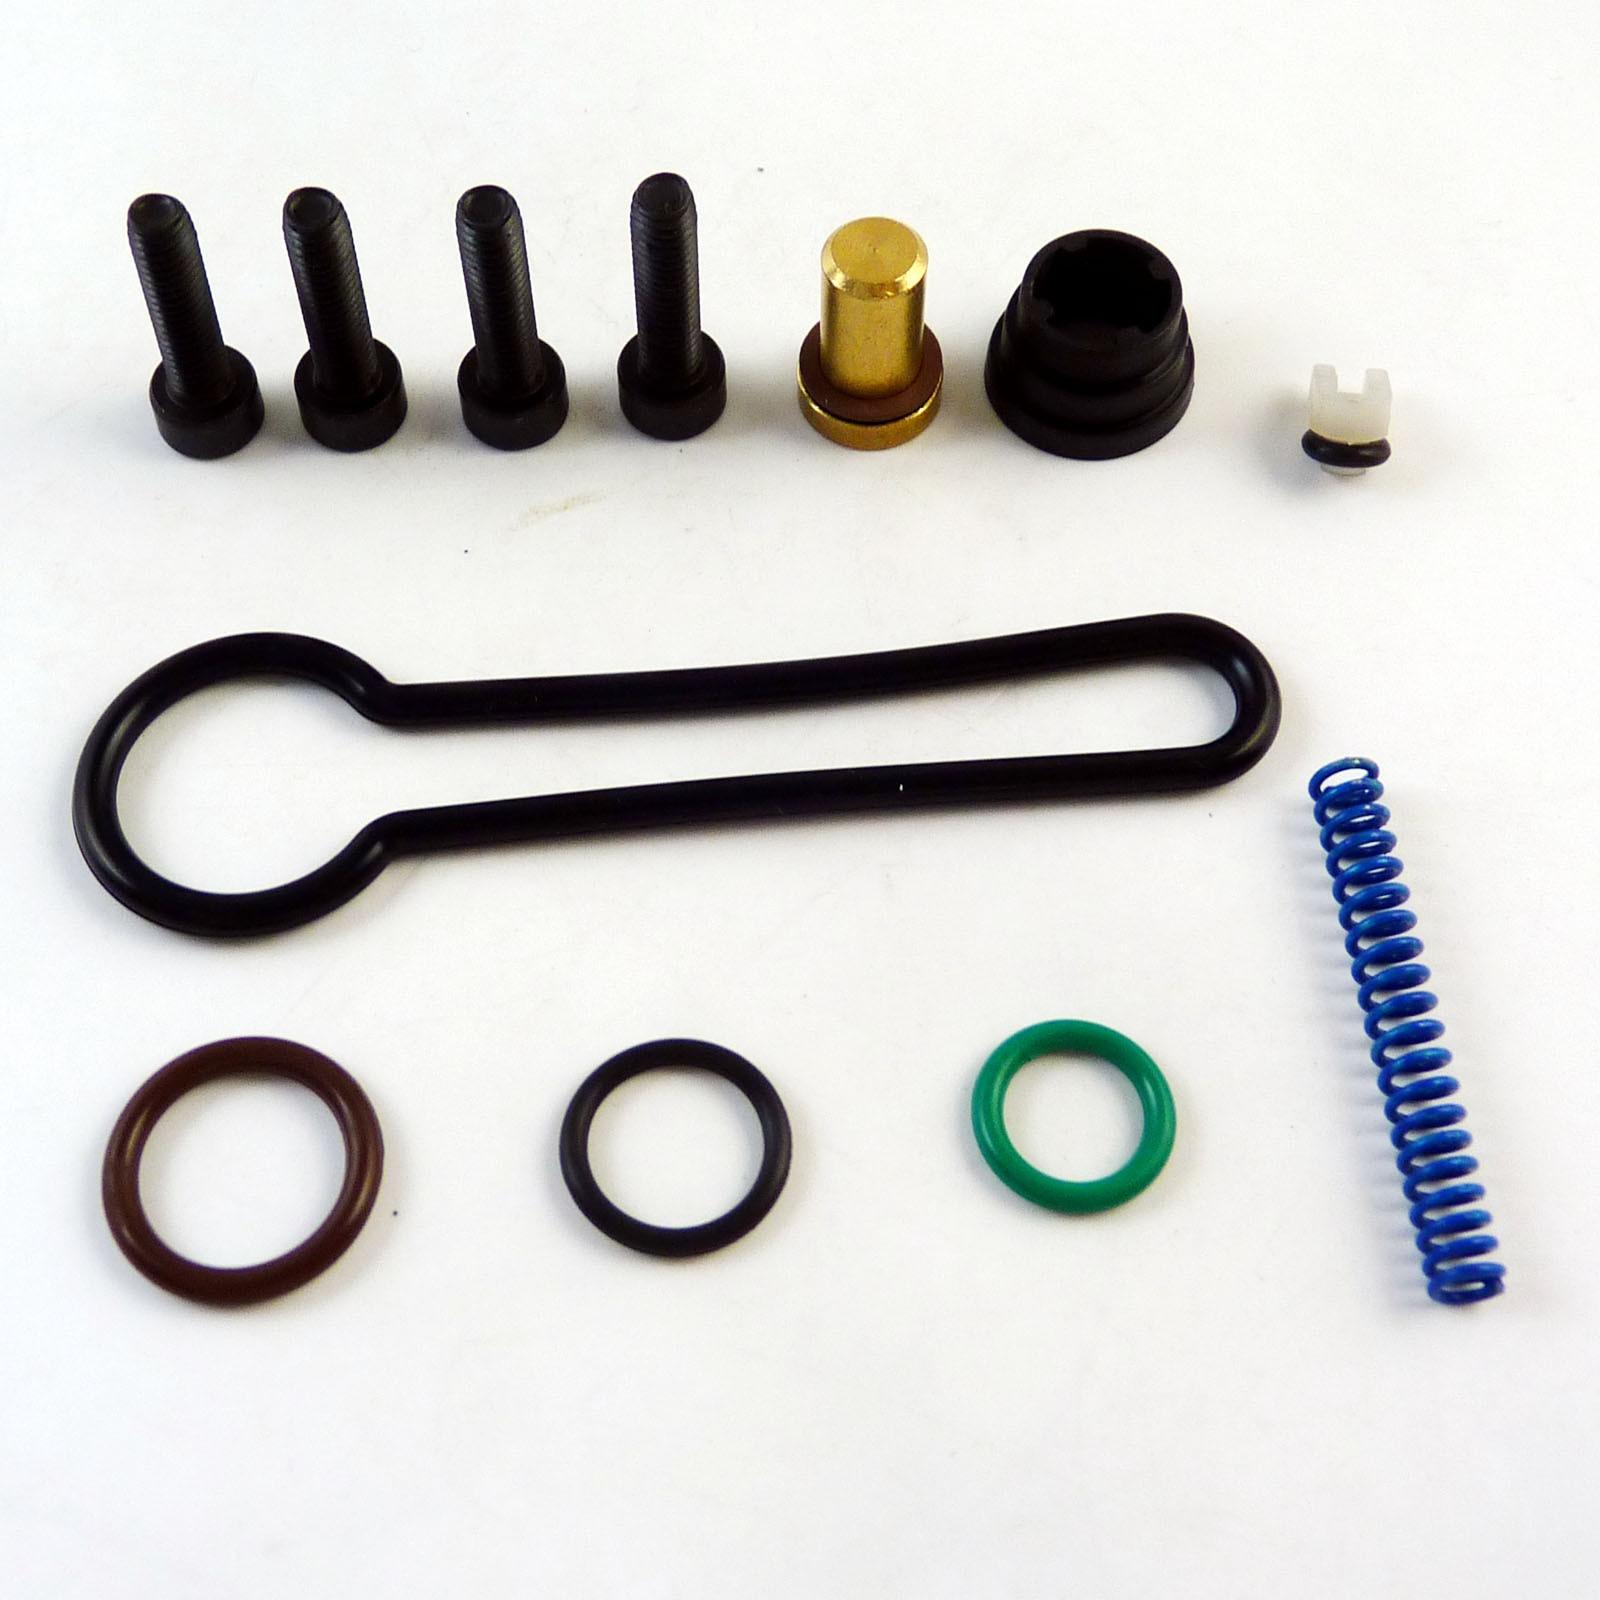 Fuel Pressure Regulator Repair Kit for Powerstroke V8 6.0L Diesel